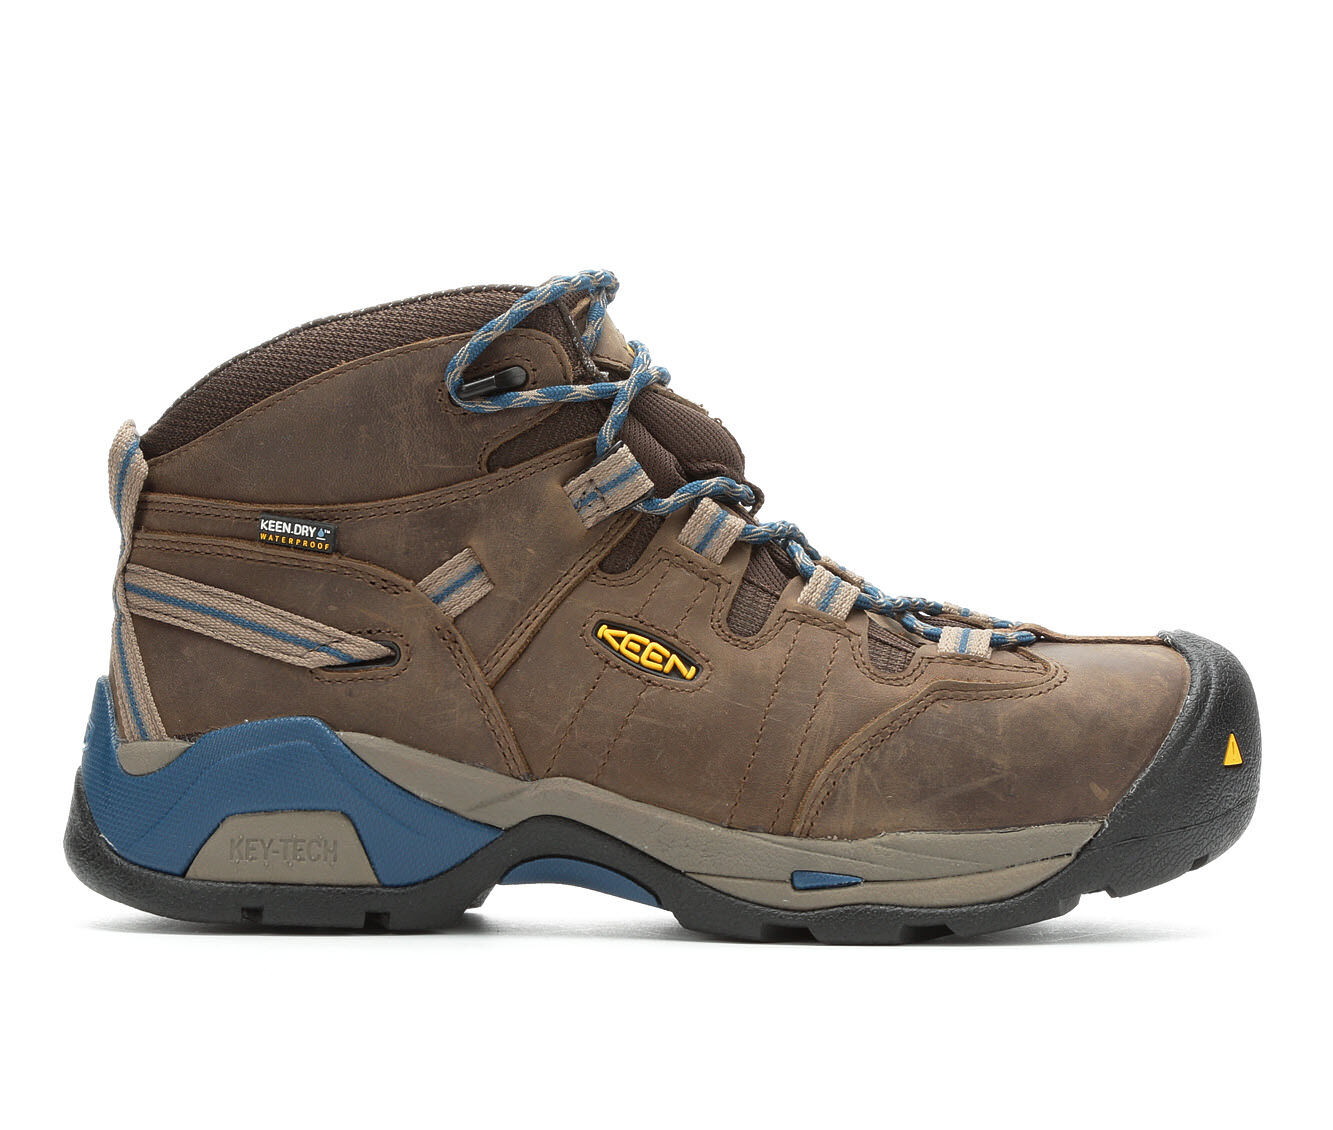 uk shoes_kd0983